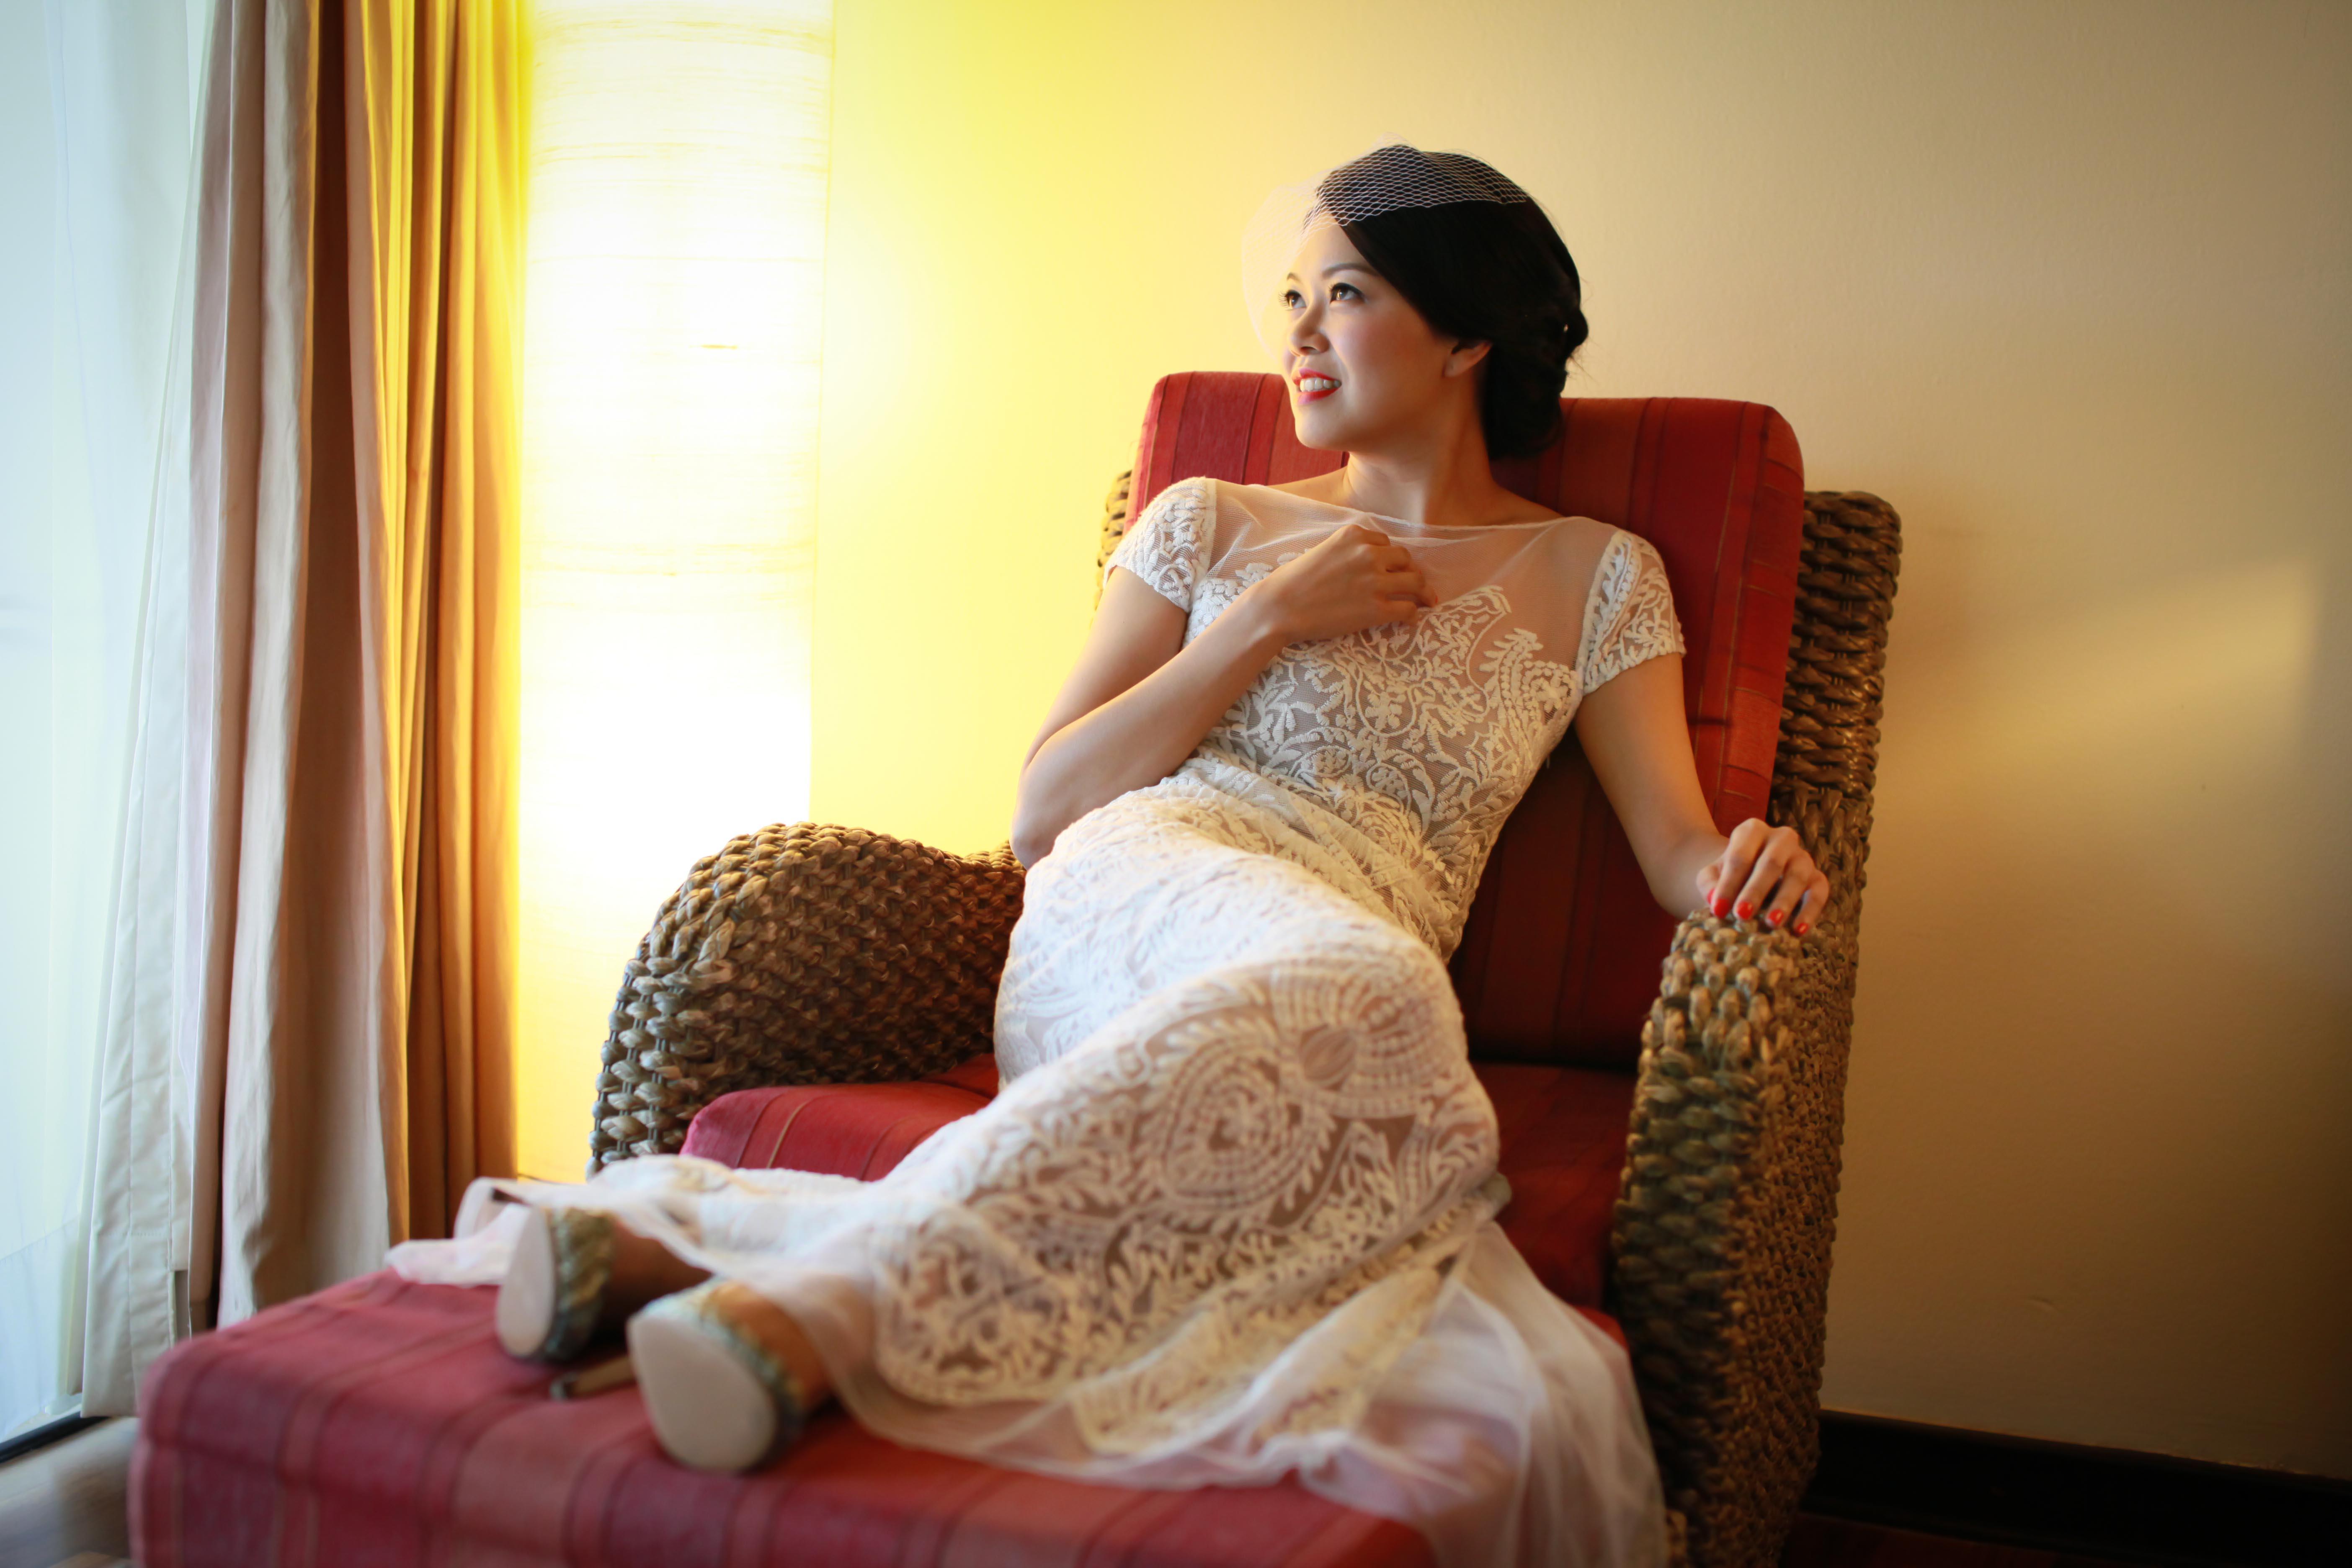 Sneak Peek - Photo shoot with Jim Liaw in Phuket wearing